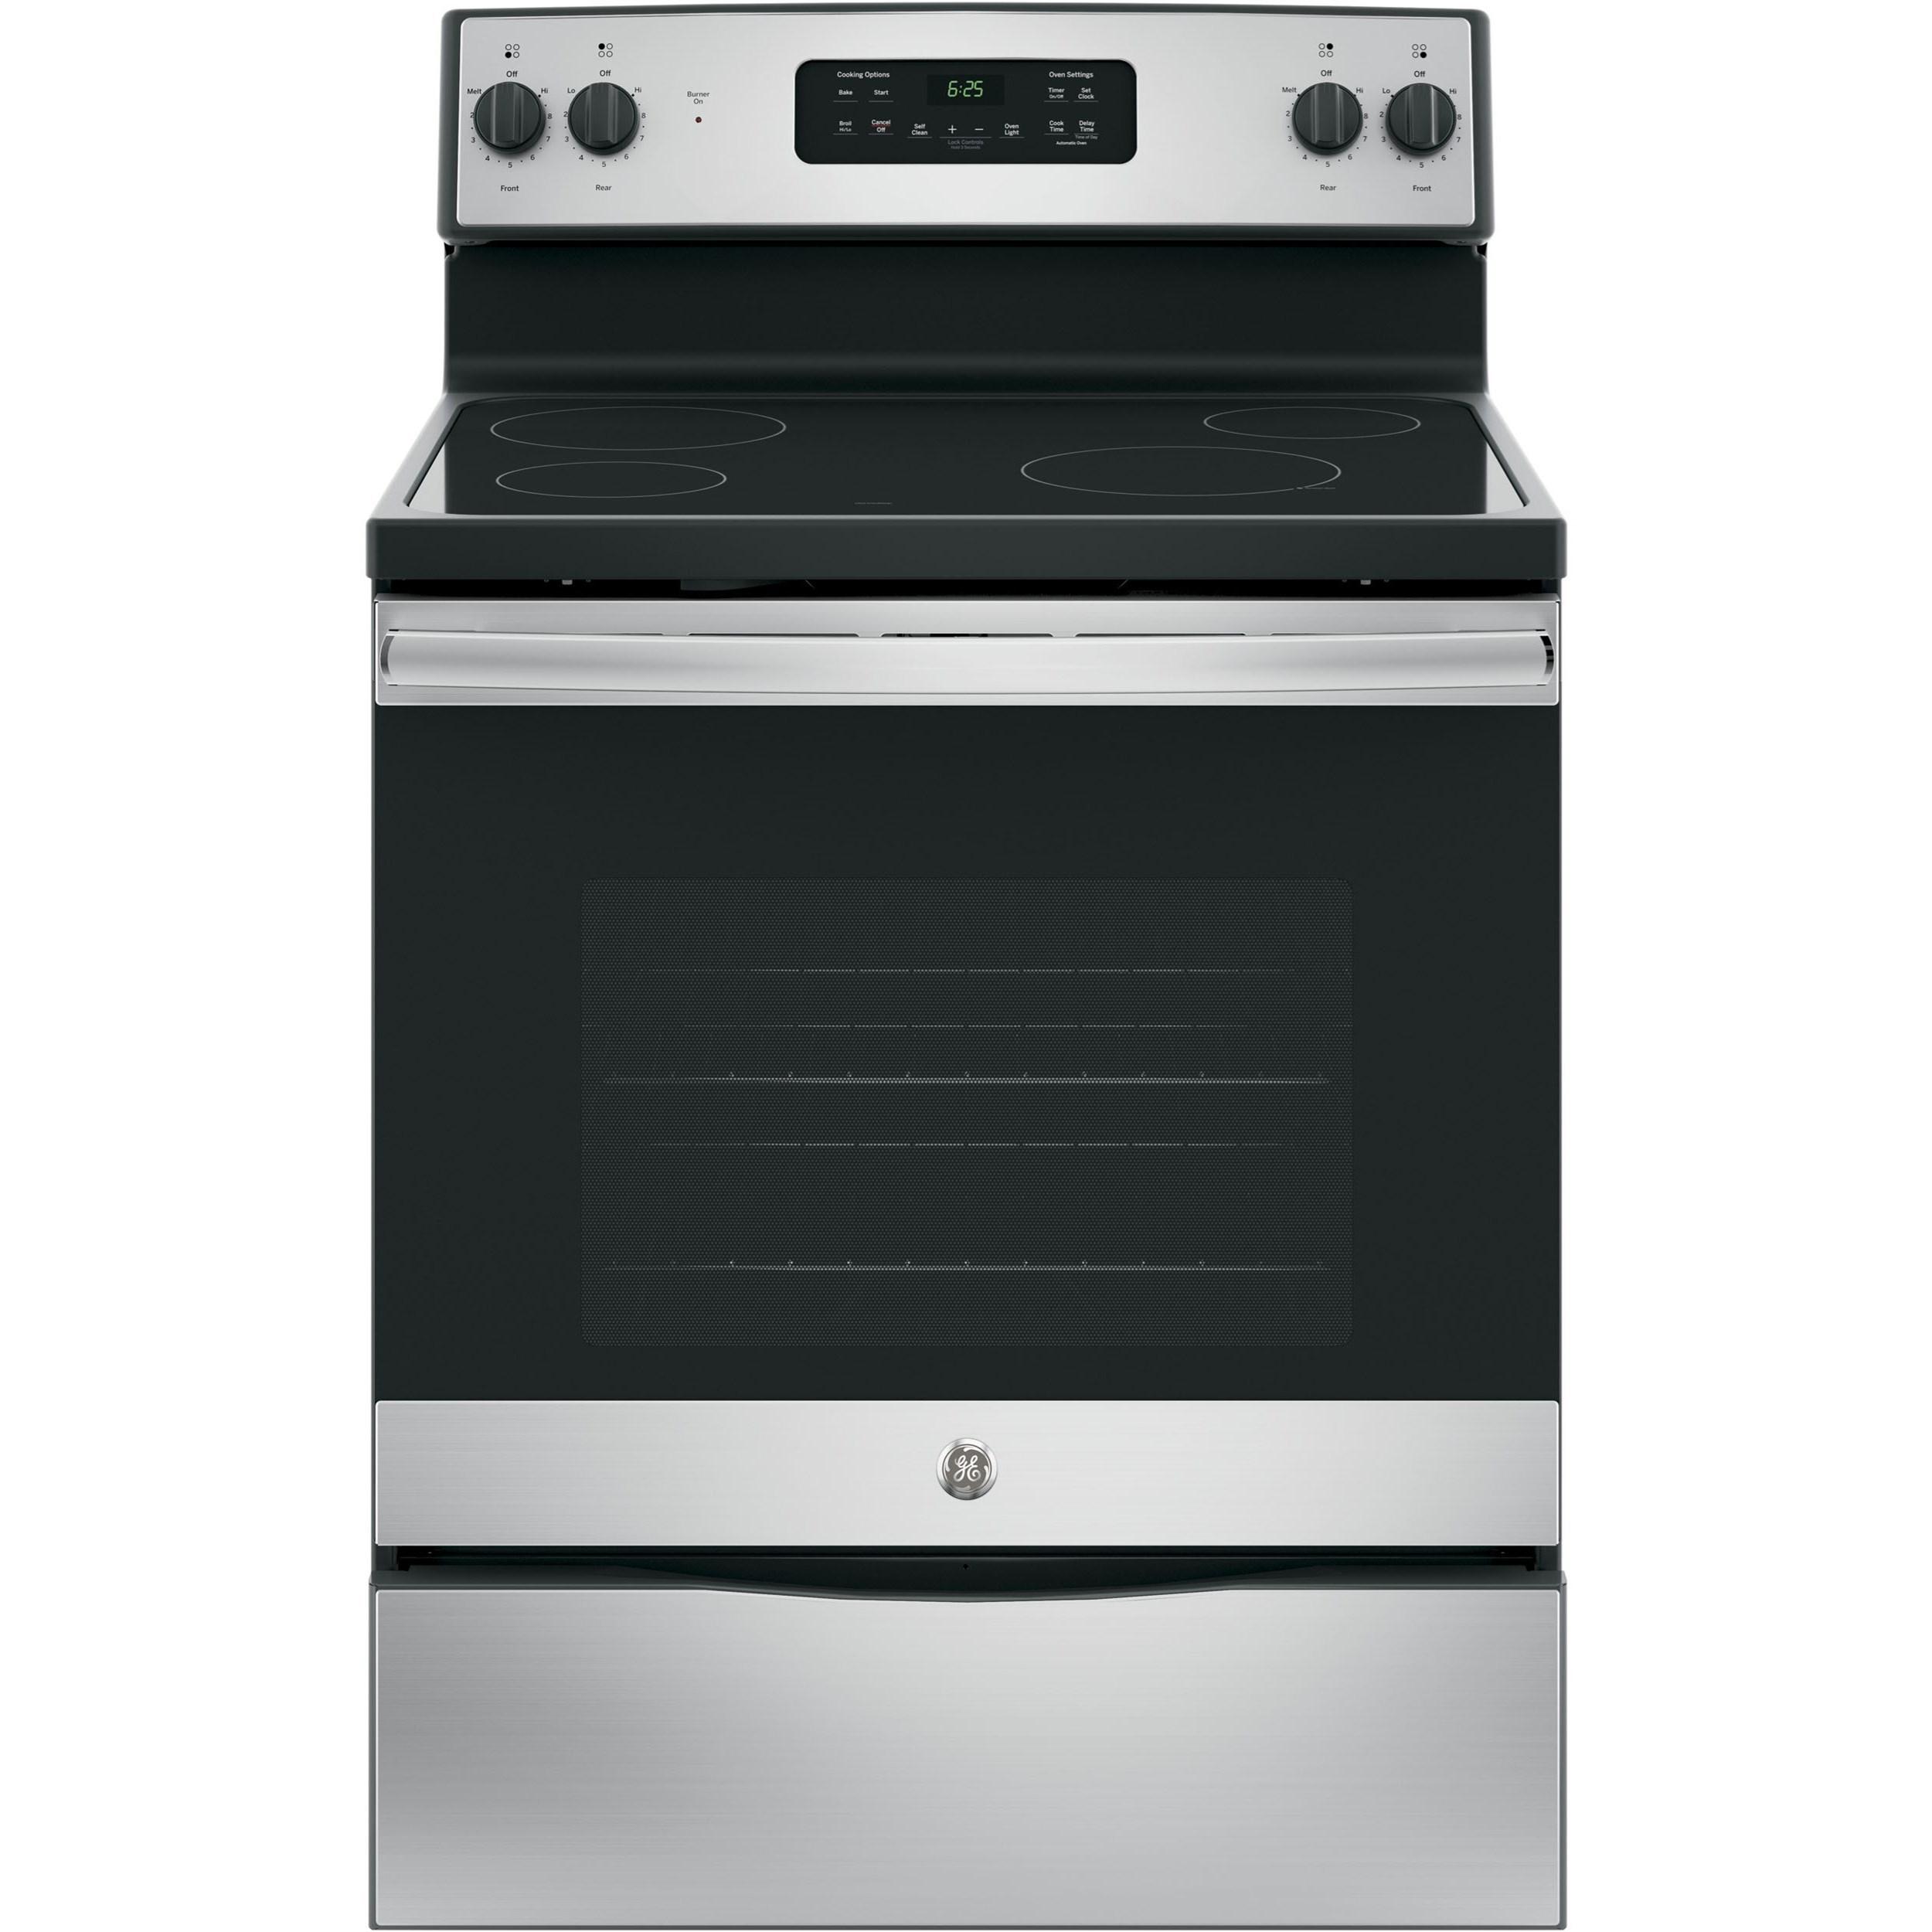 "GE Appliances GE Electric Ranges GE® 30"" Free-Standing Electric Range - Item Number: JB625RKSS"